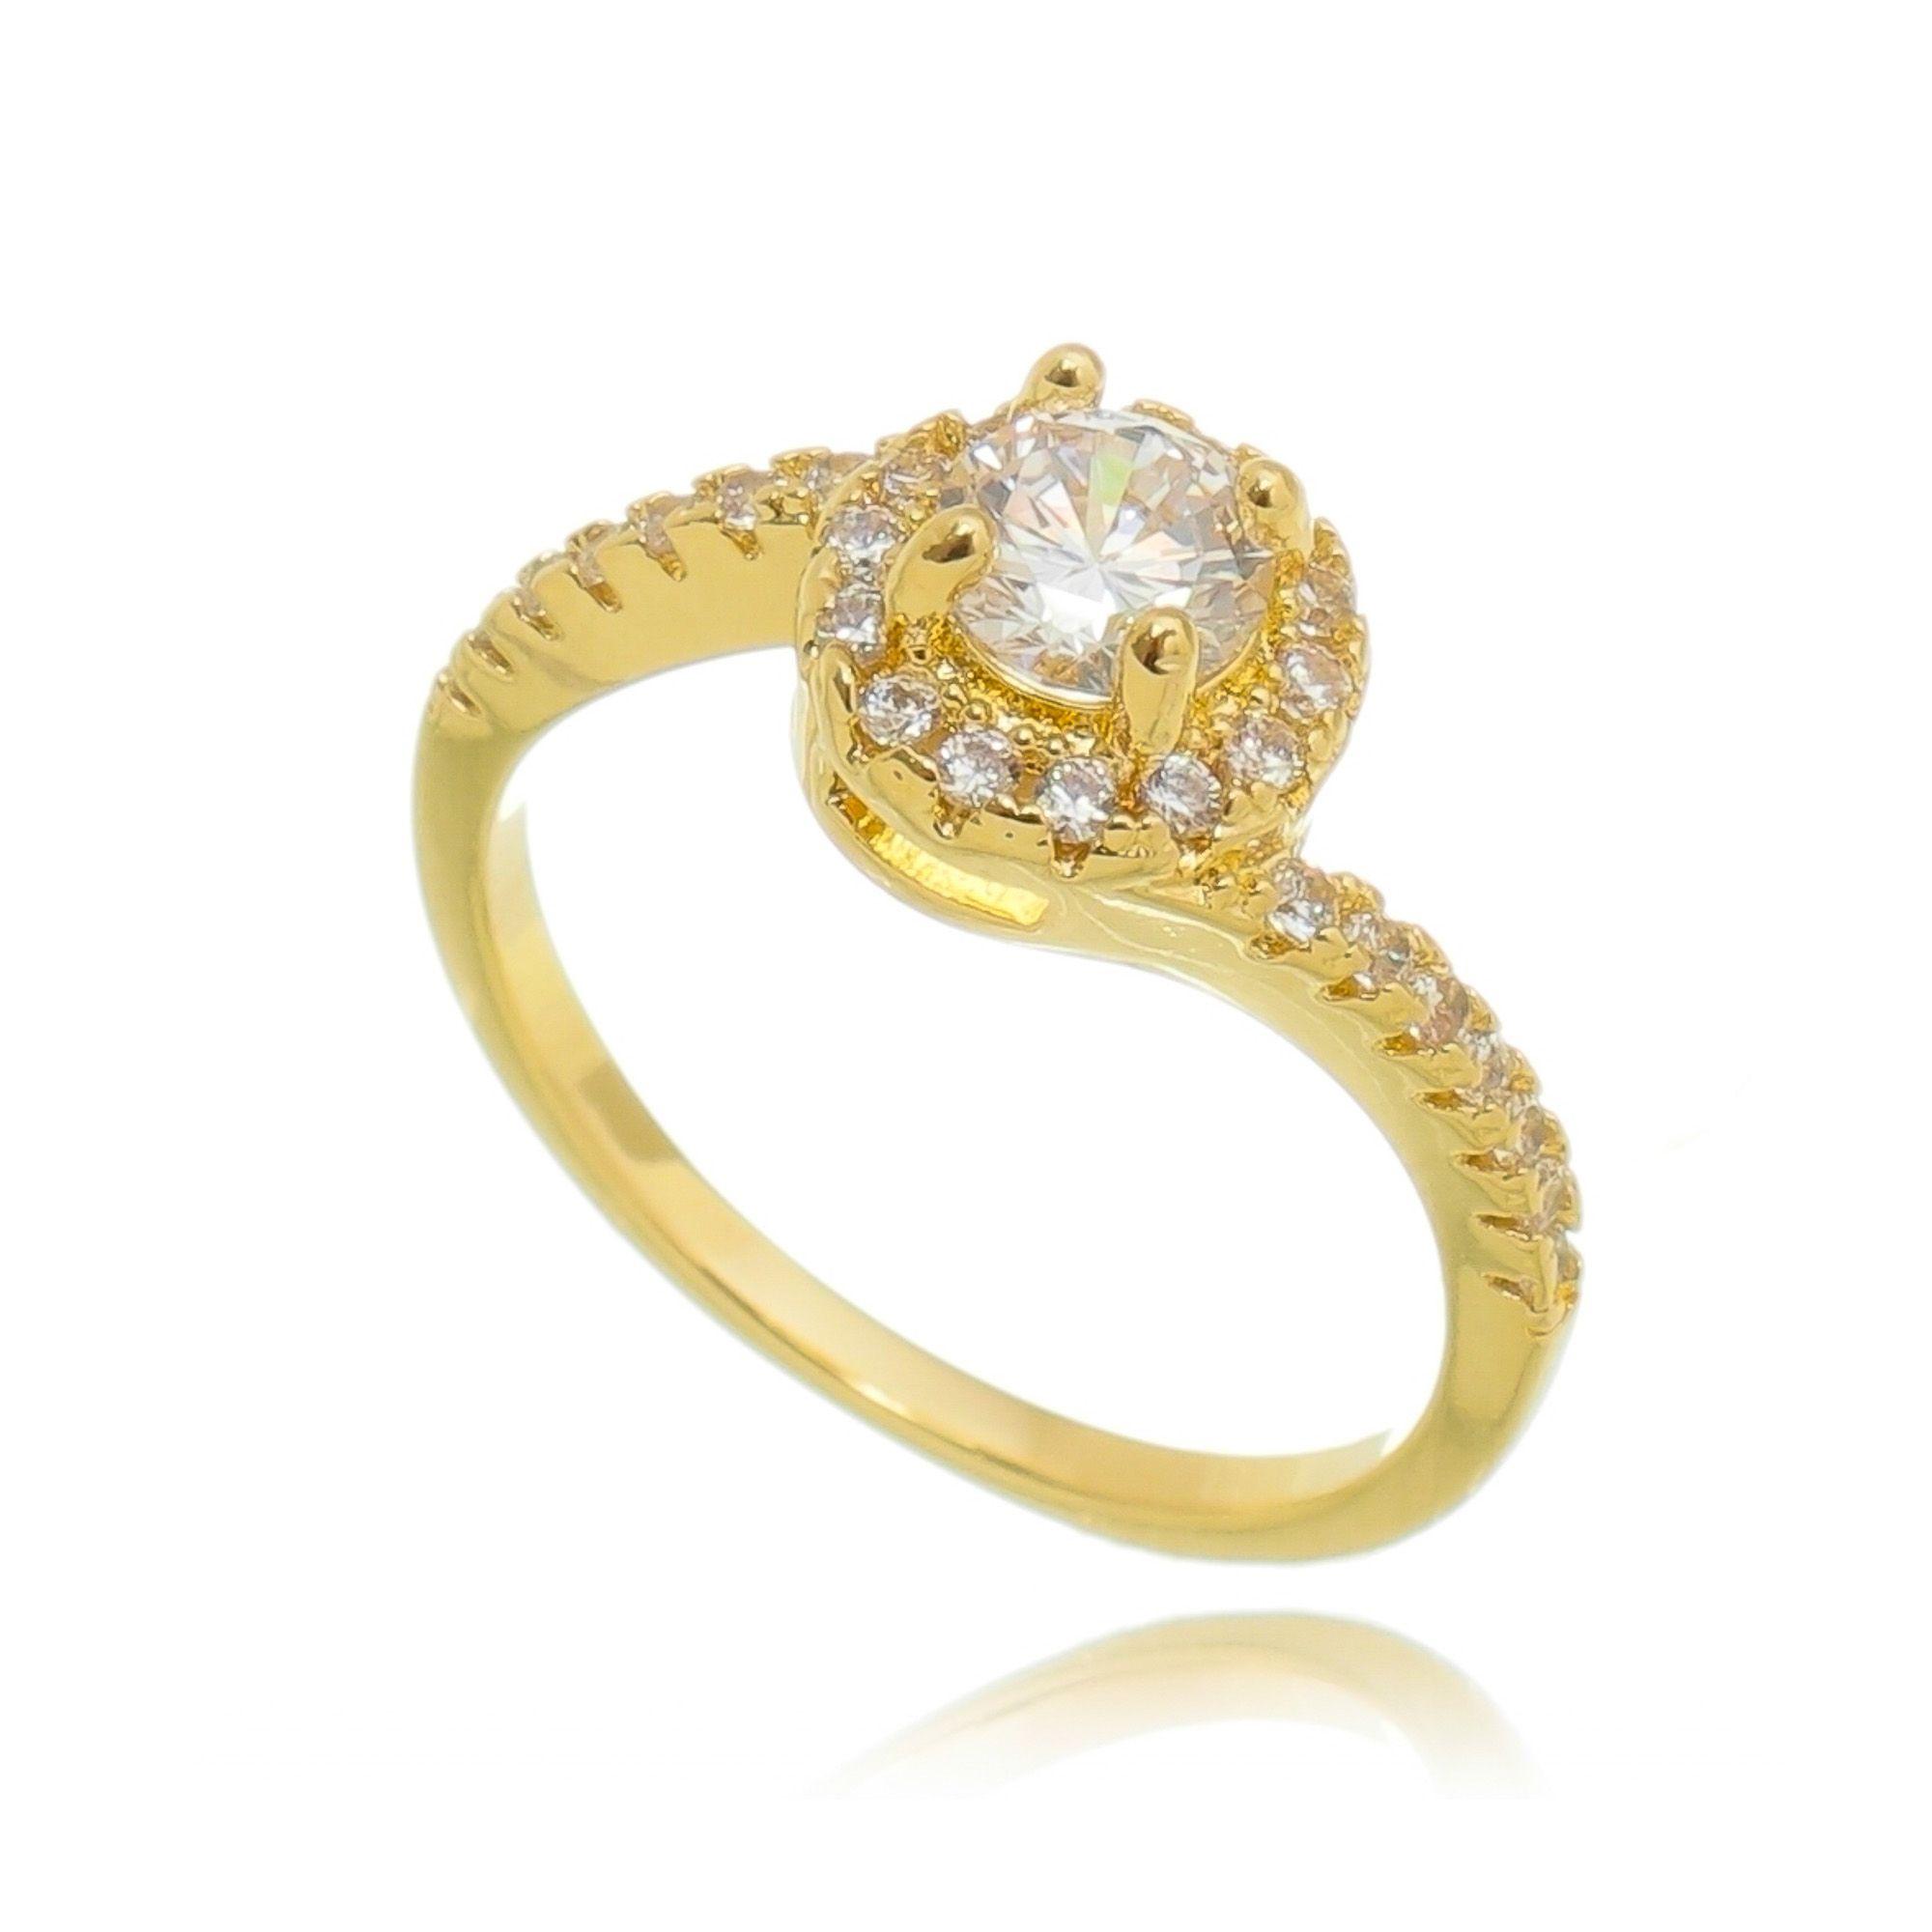 Anel Solitário de Zircônia Cristal Semijoia Luxuosa em Ouro 18K  - SOLOYOU